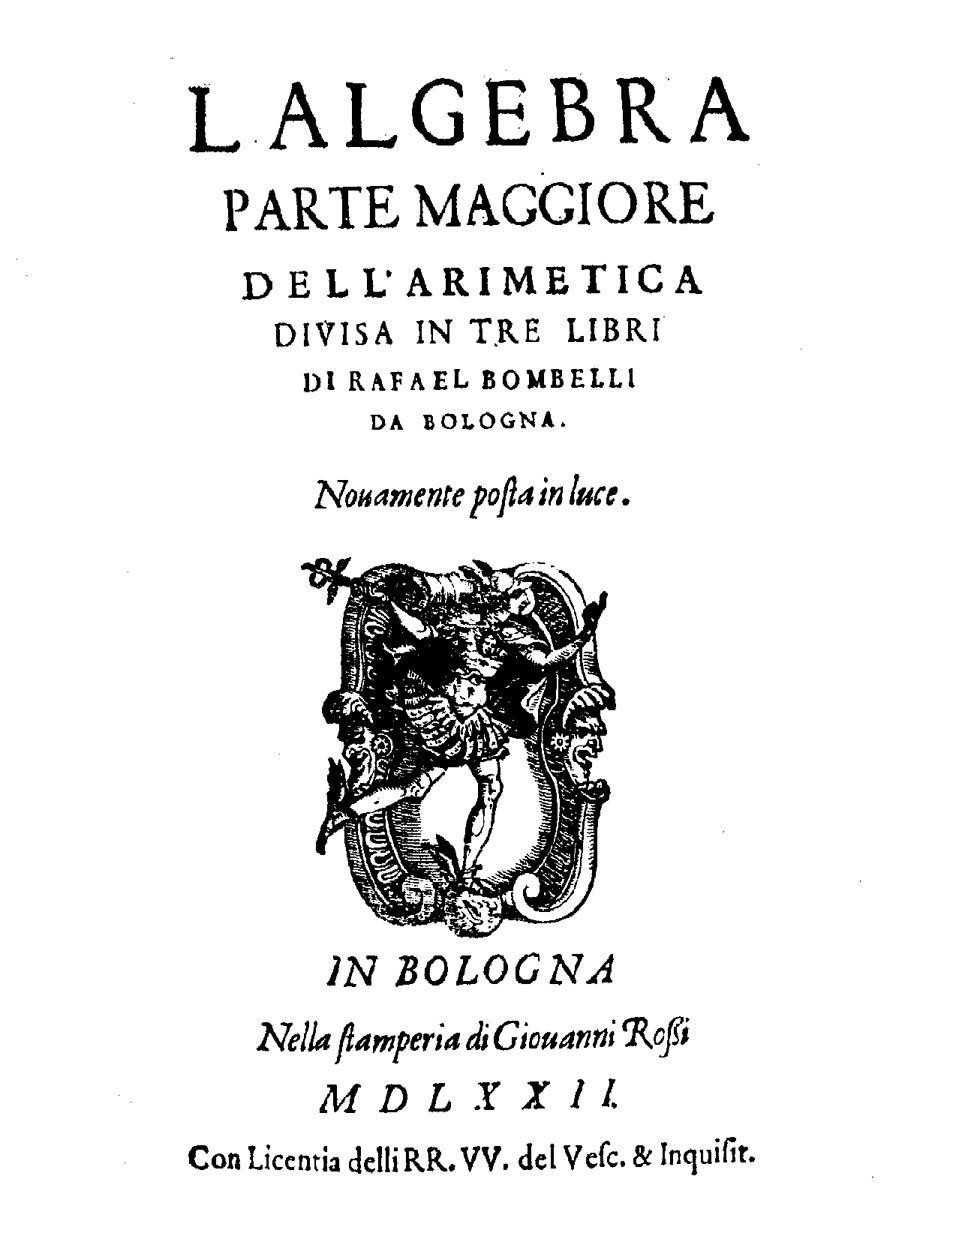 https://upload.wikimedia.org/wikipedia/commons/7/72/Bombelli_-_Algebra,_1572_-_56656.jpg